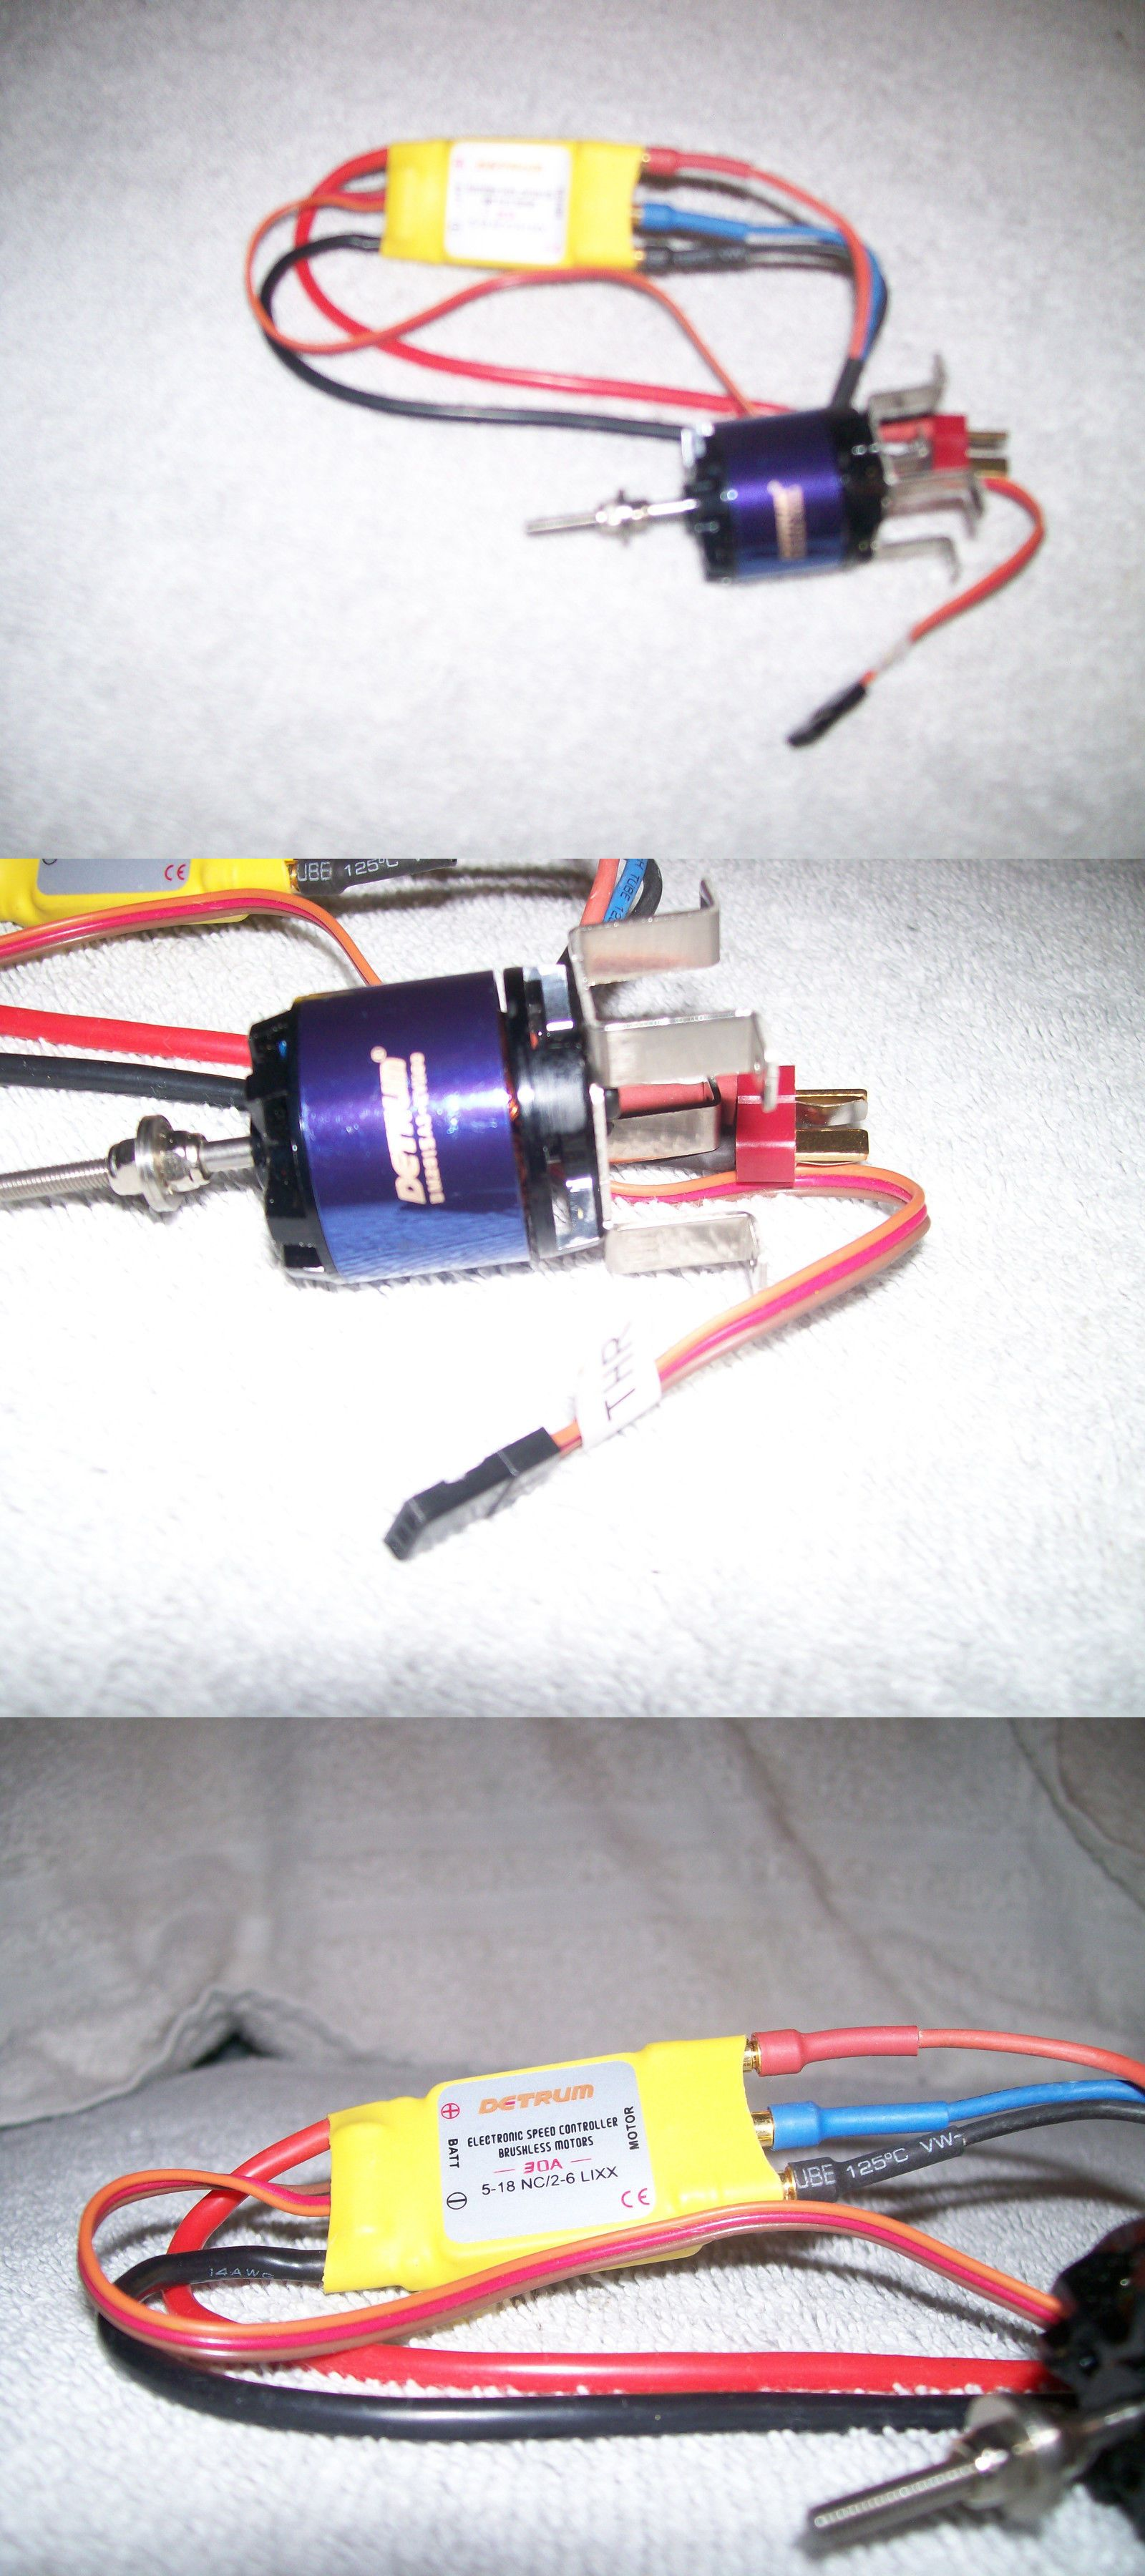 Electric Motors 100058: Detrum Bm2815a3 Kv1100 Brushless Motor For Dynam  Piper Cub Rc Airplane -